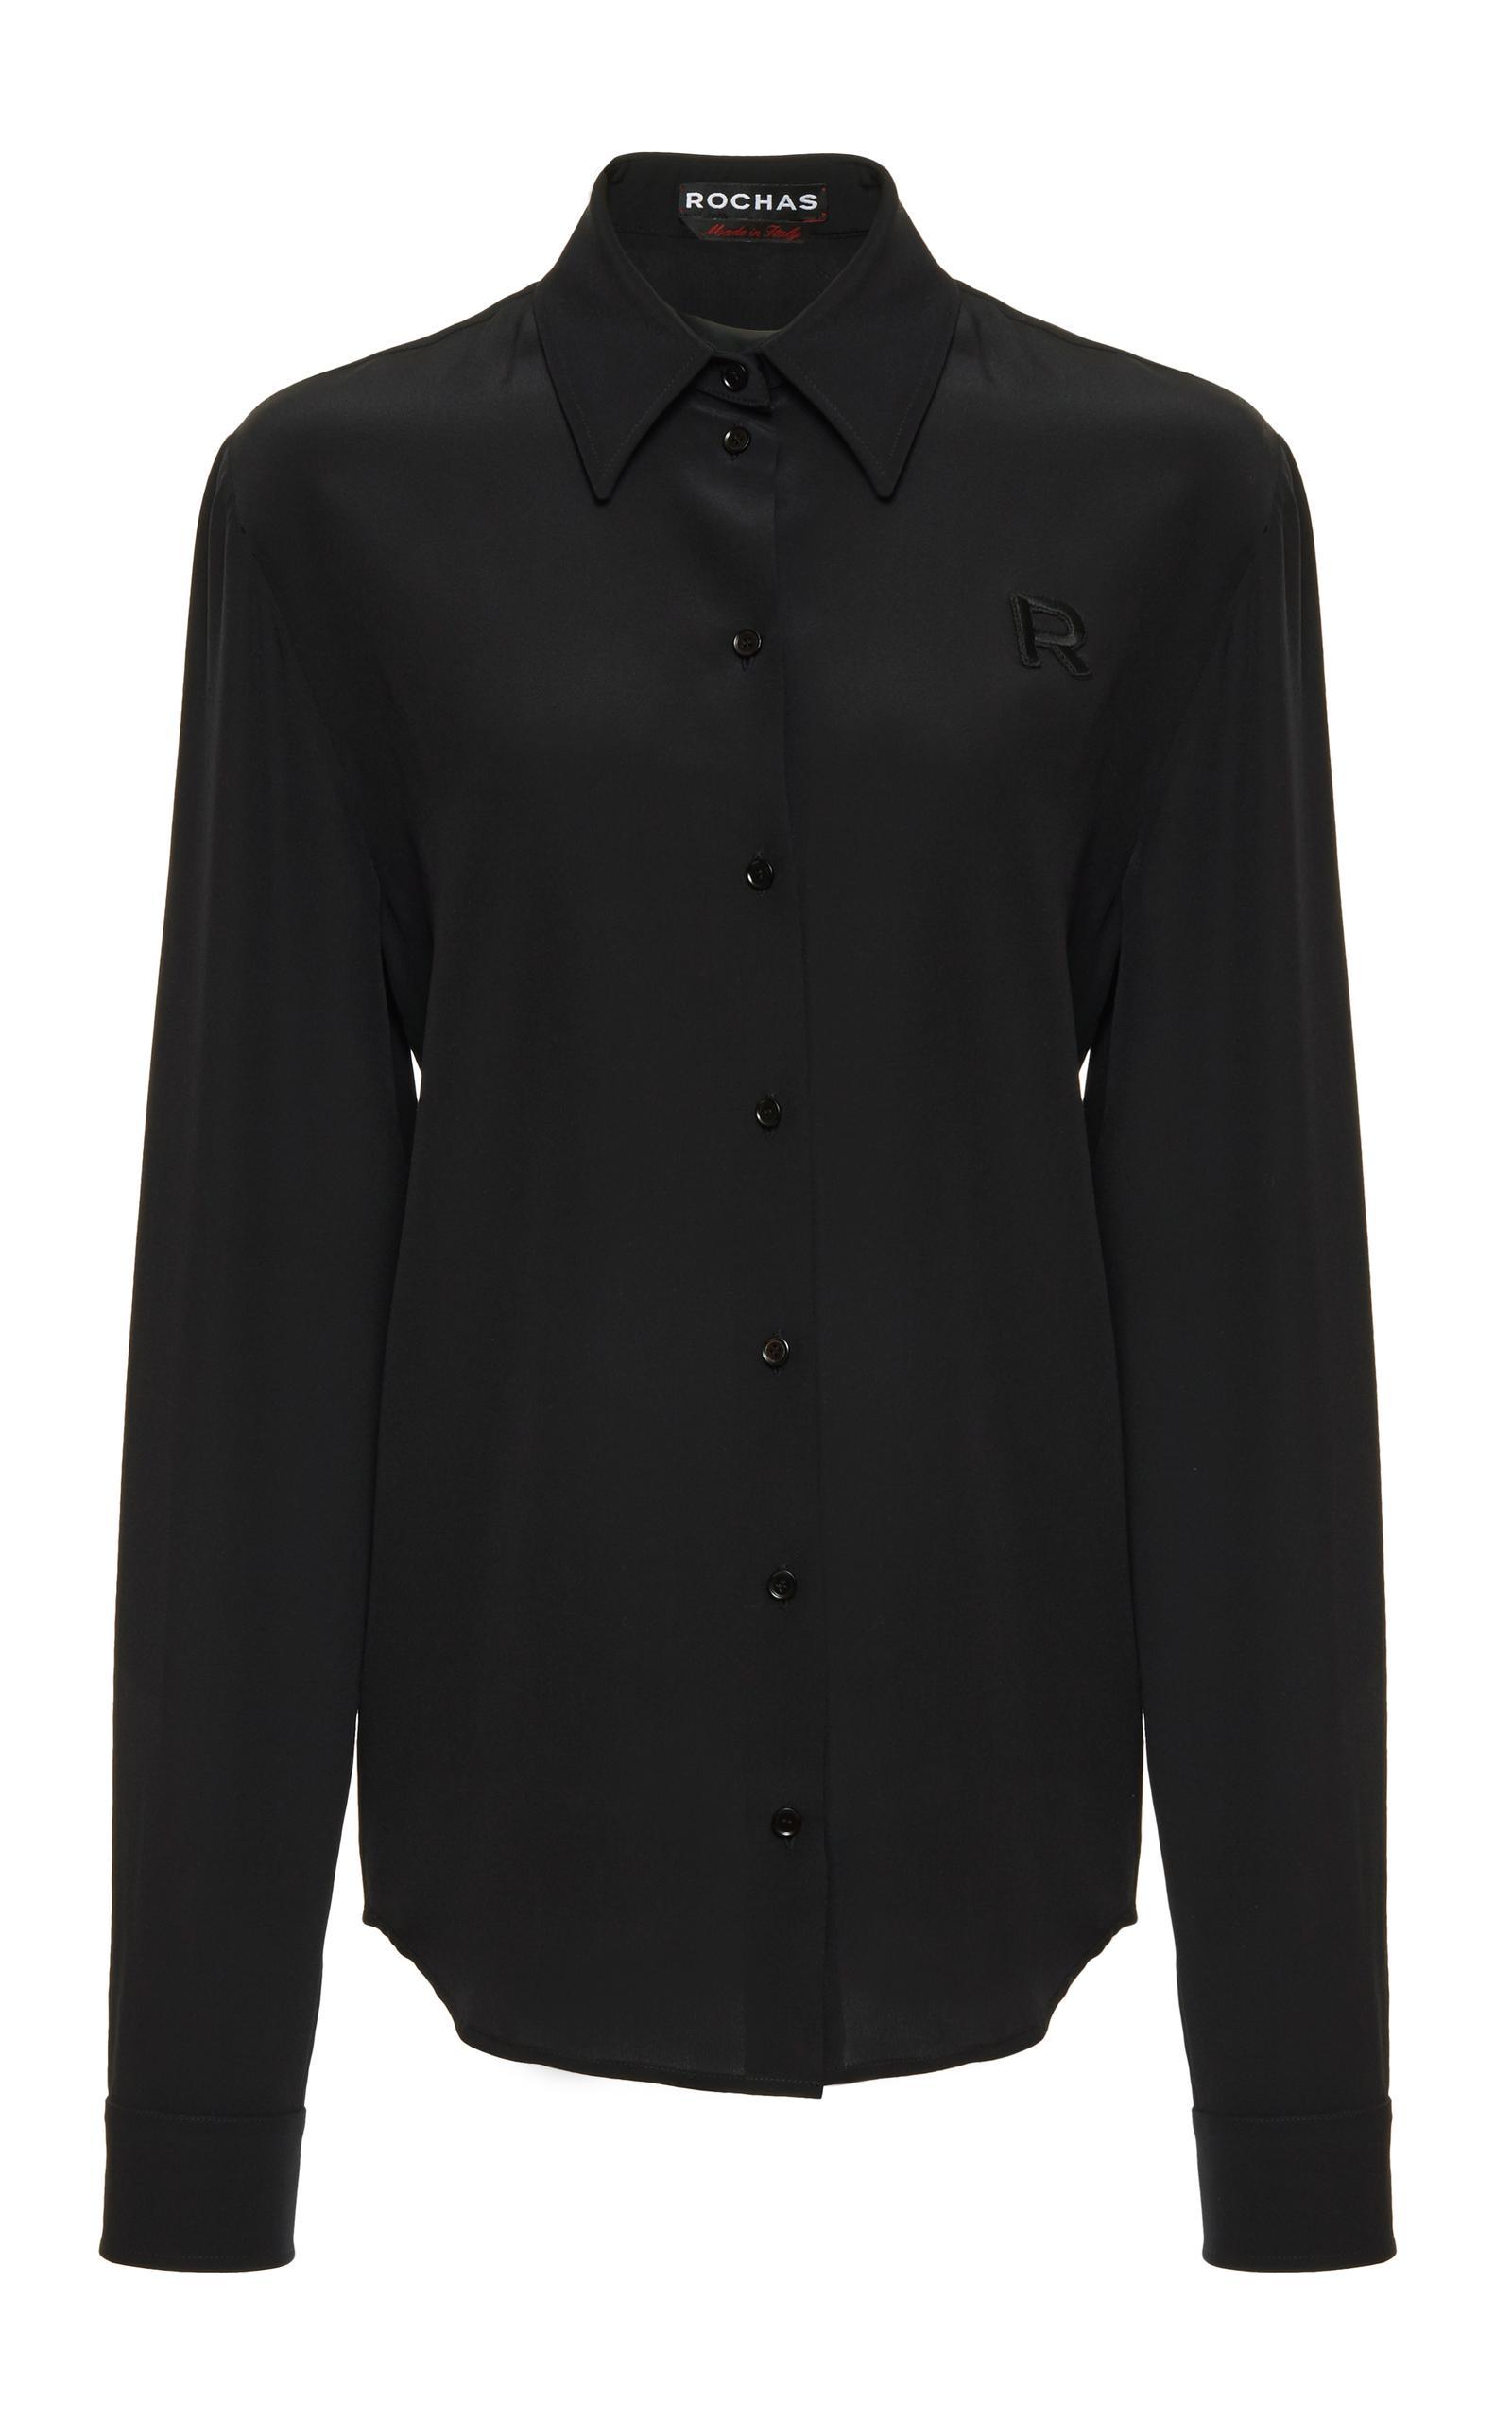 Rochas basic silk button down shirt in black lyst for Black silk button down shirt